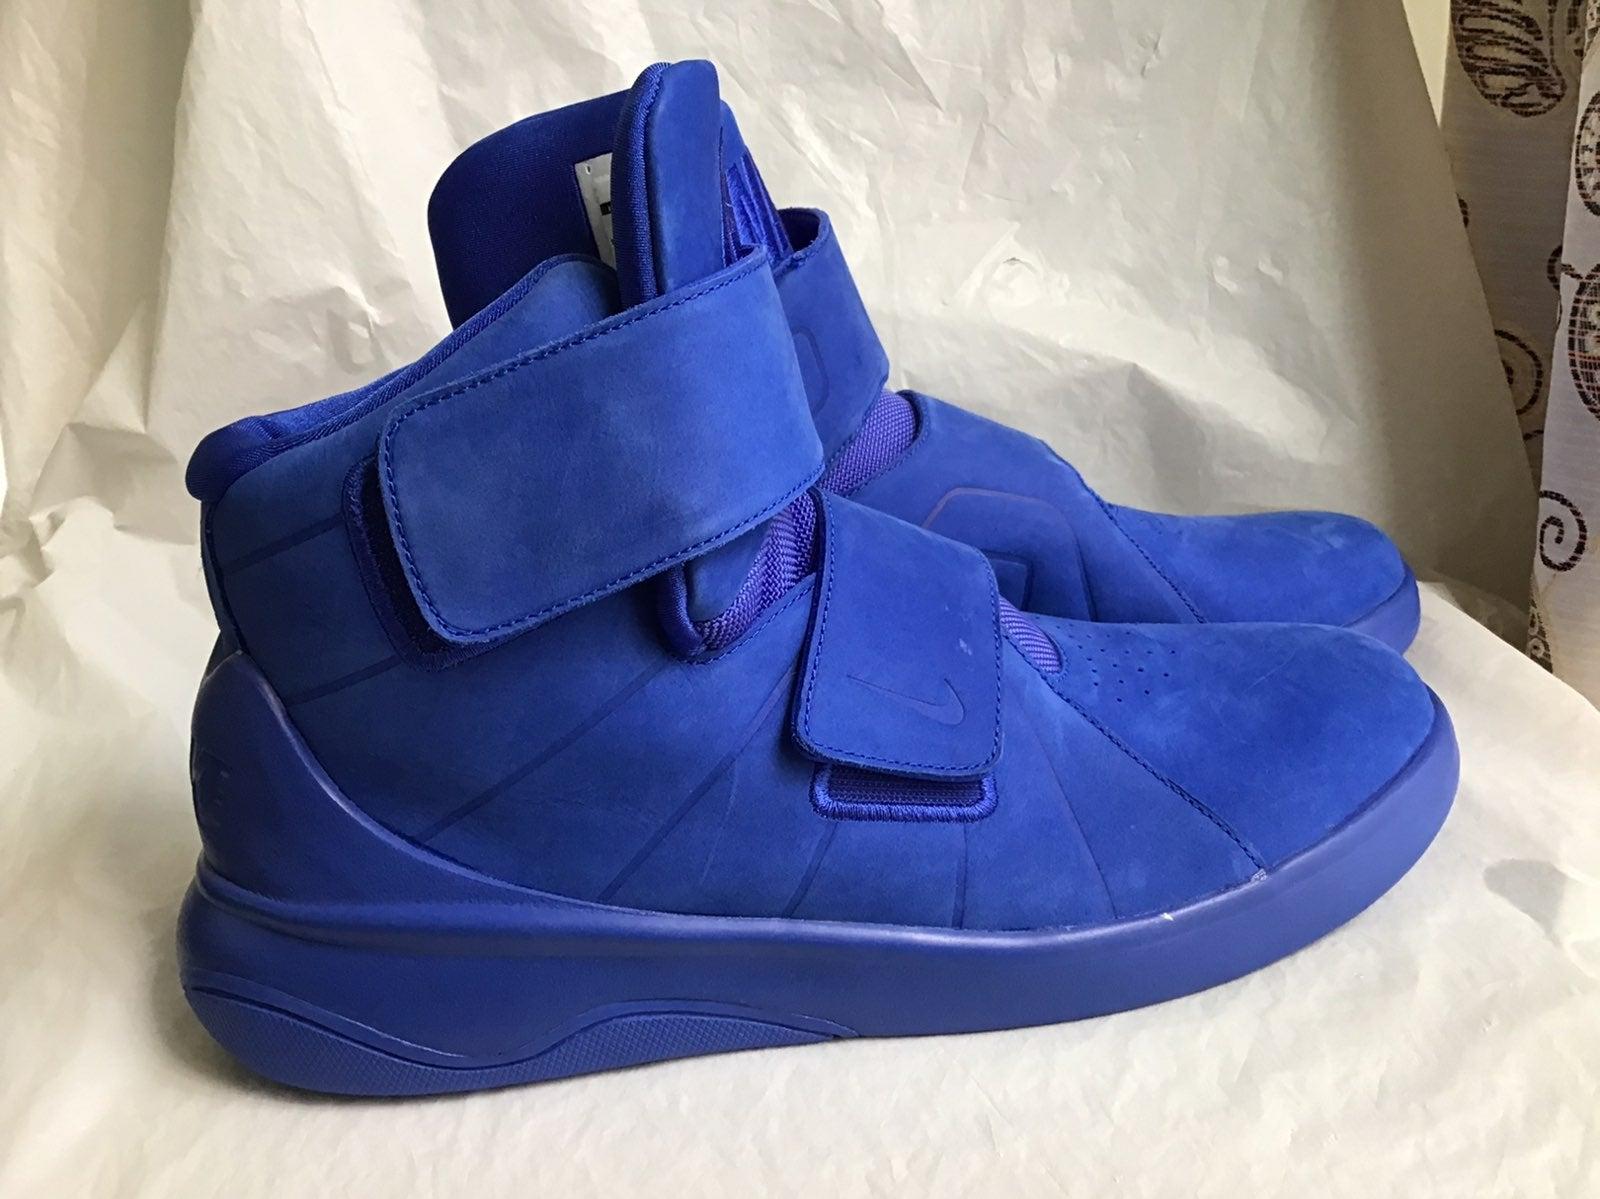 Nike Marxman PRM Racer Blue sz10. 1M